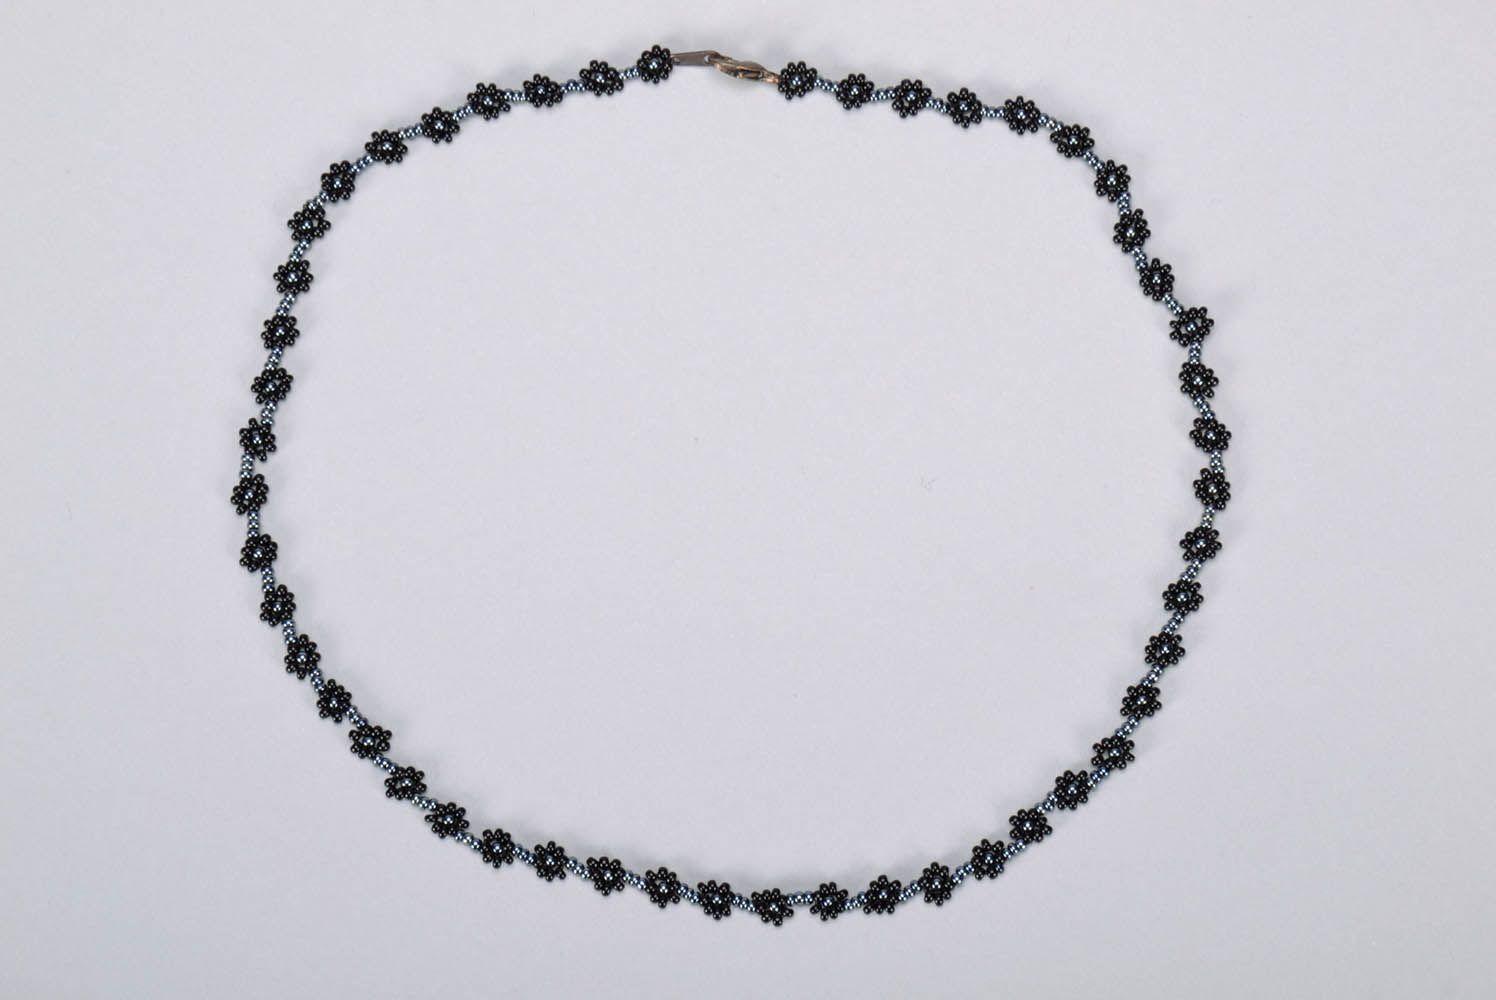 Black beaded necklace-bracelet photo 2